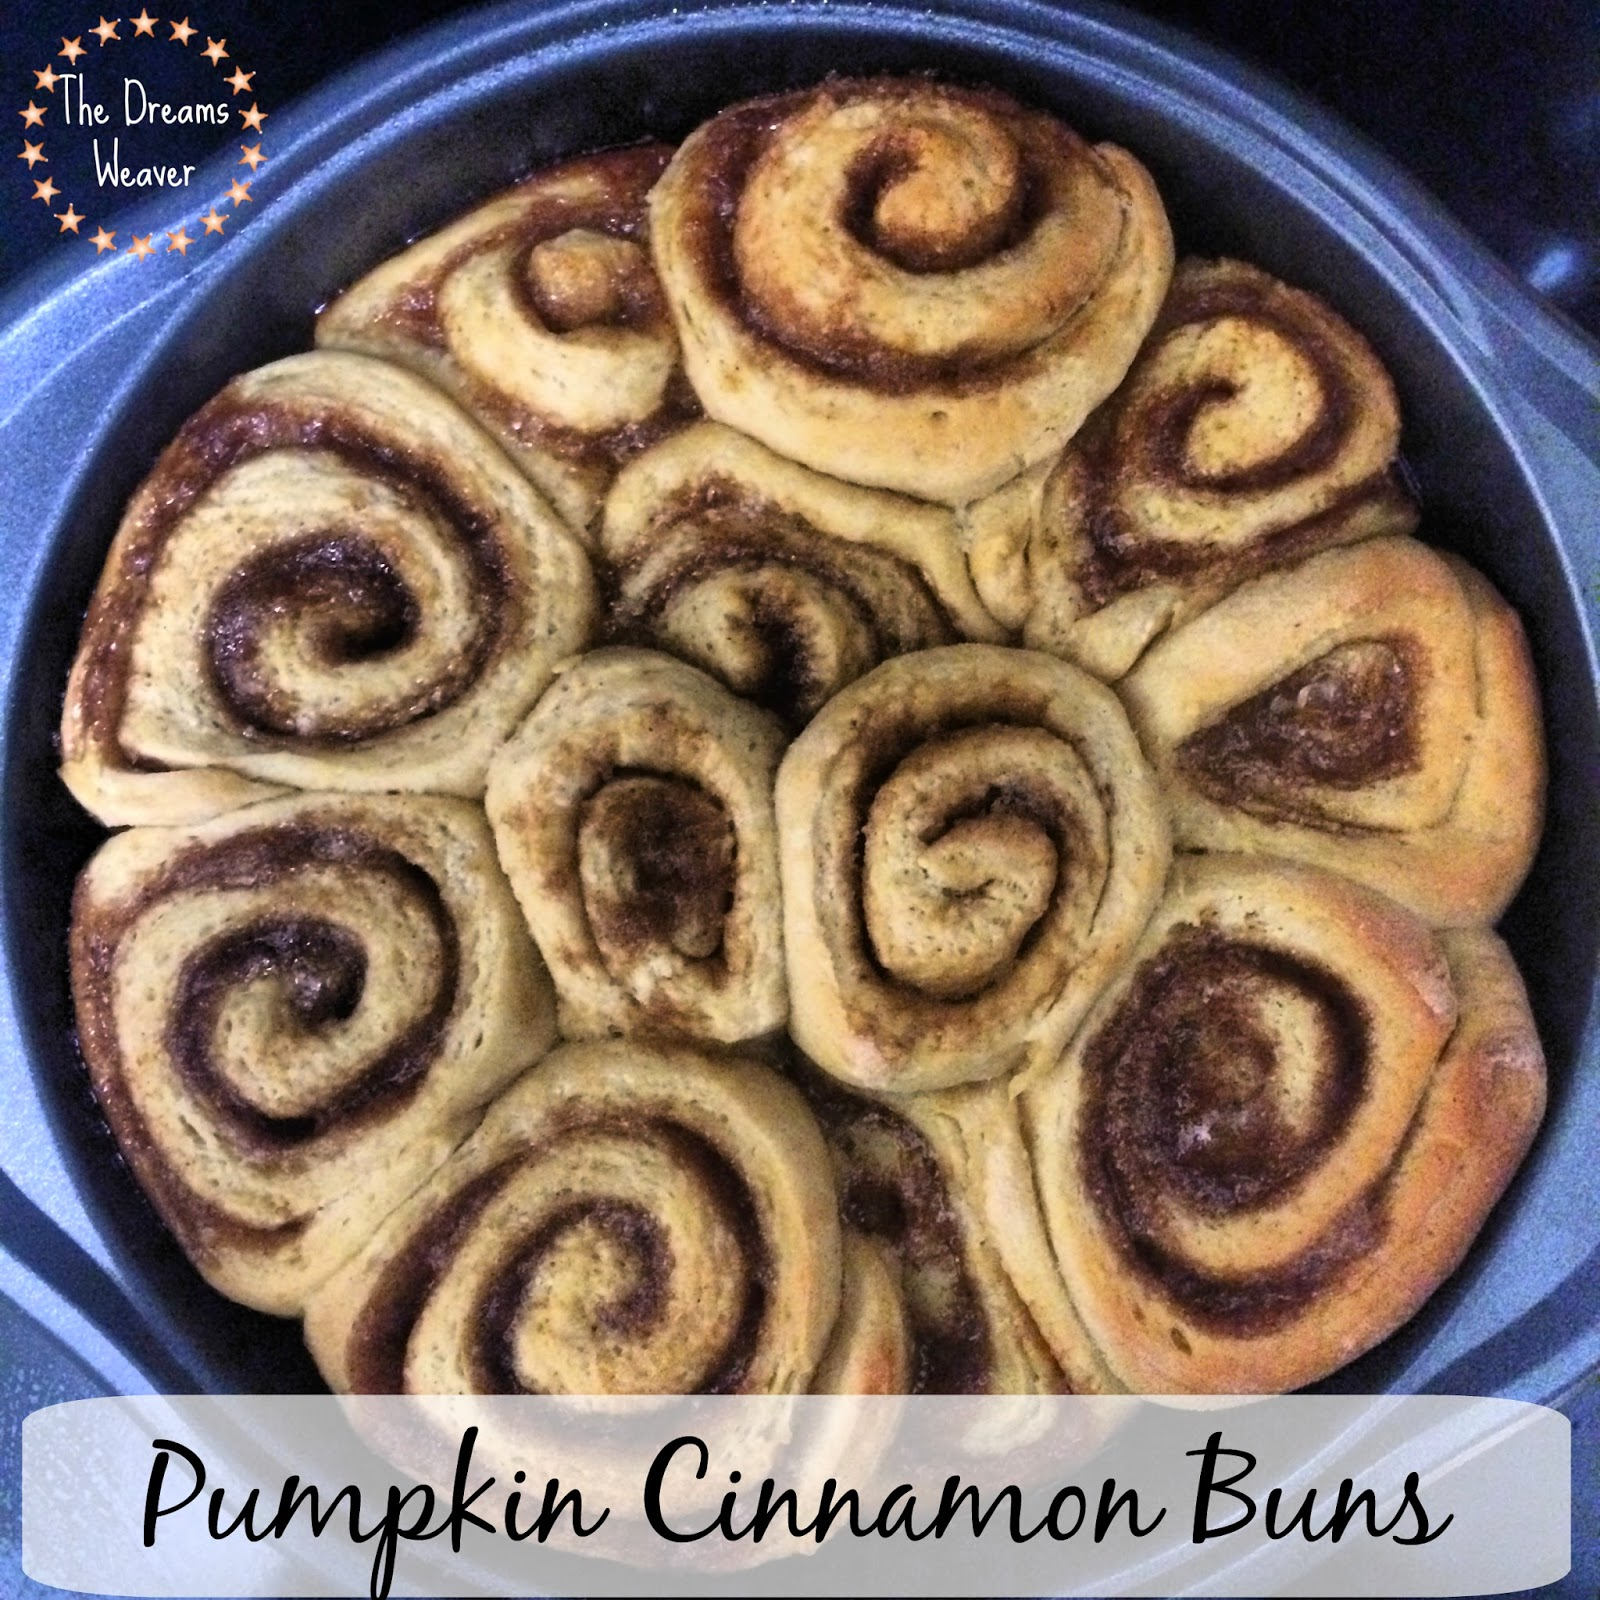 Pumpkin Cinnamon Buns